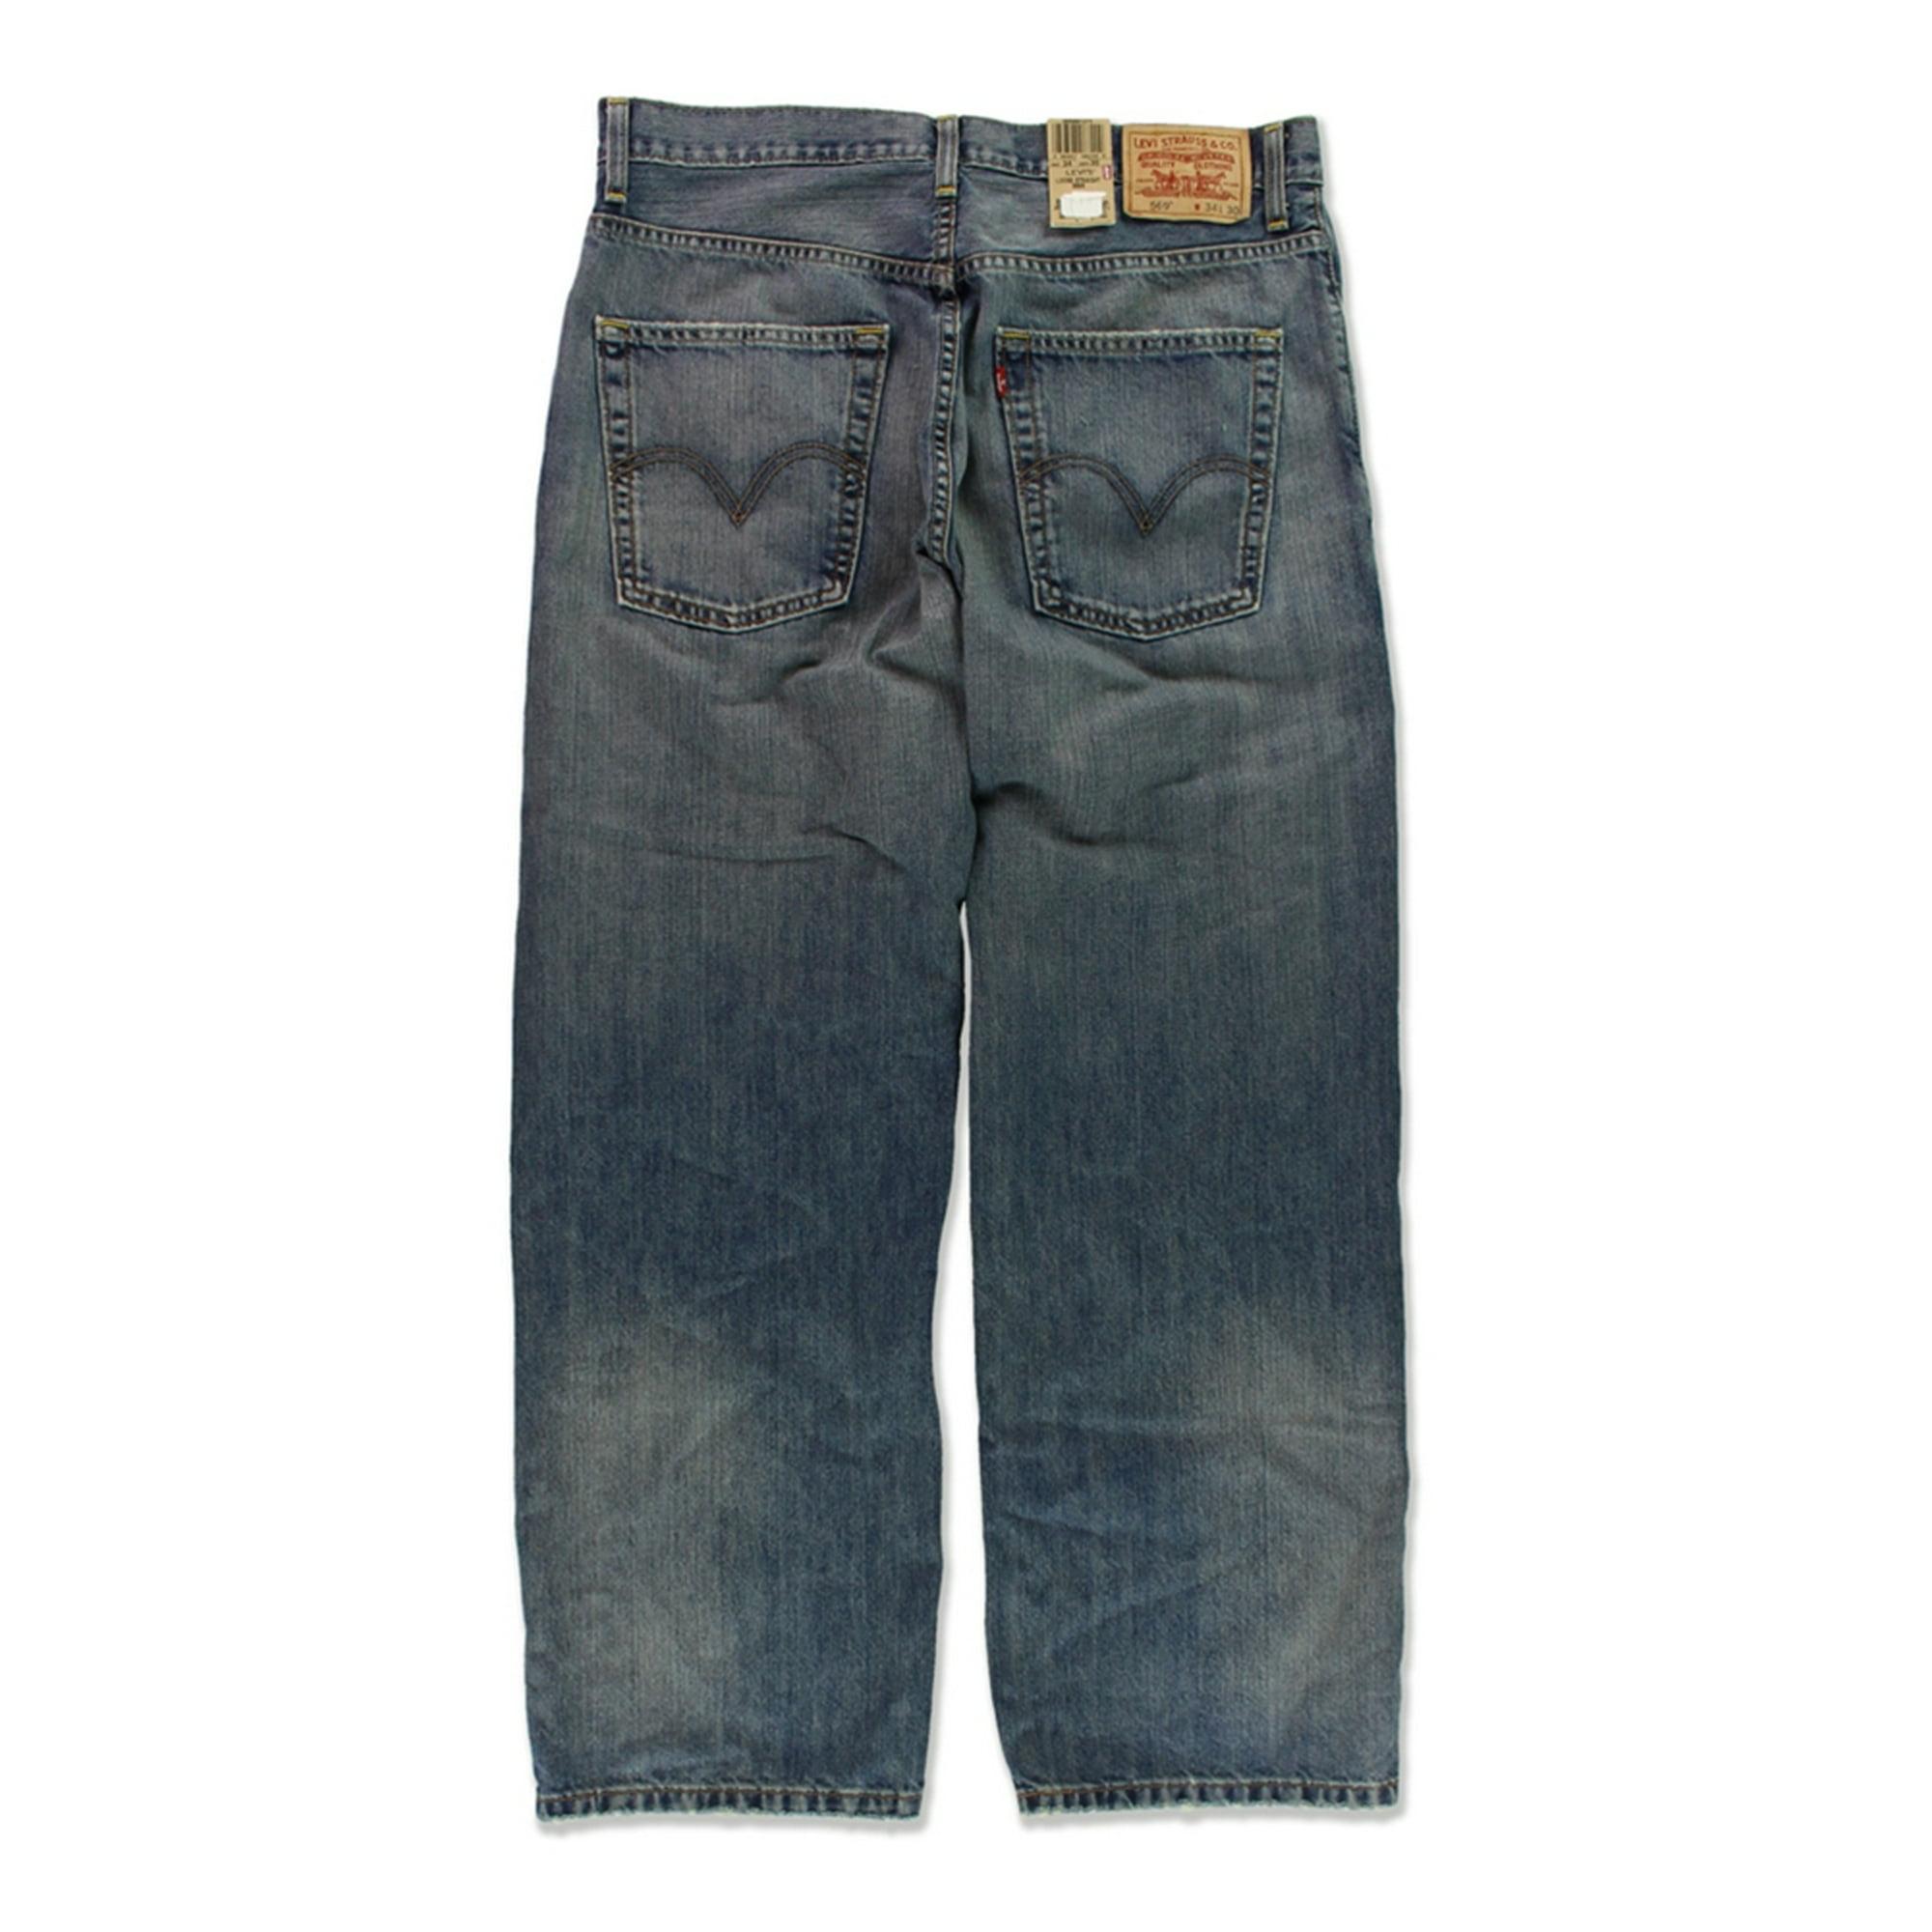 Straight Leg Jeans Lightwash 30x30